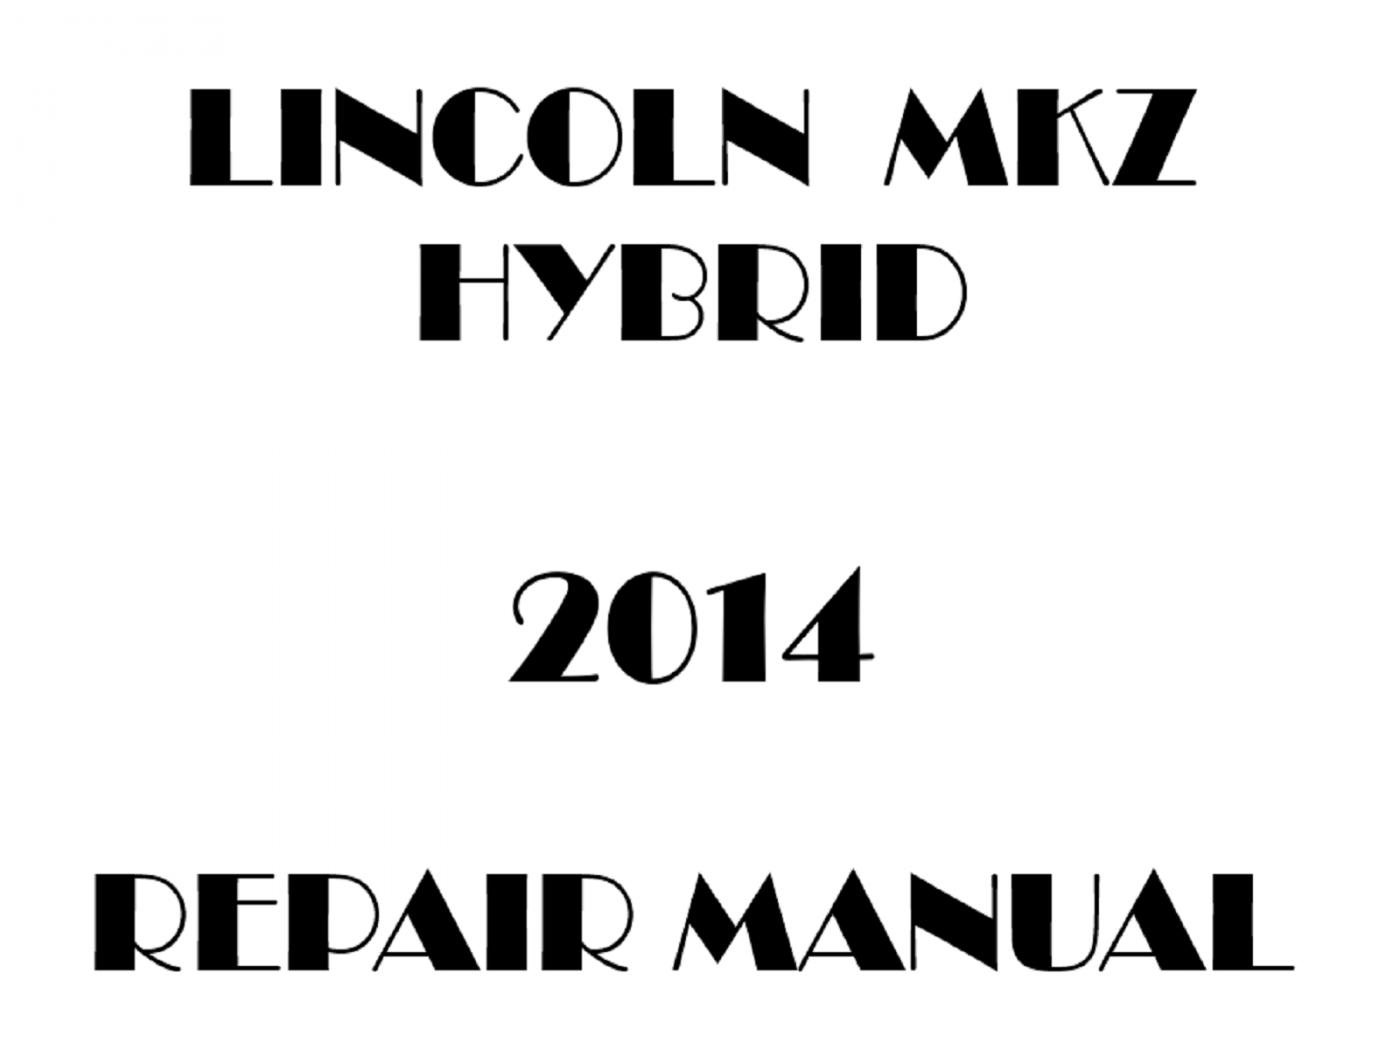 2014 Lincoln MKZ Hybrid repair manual